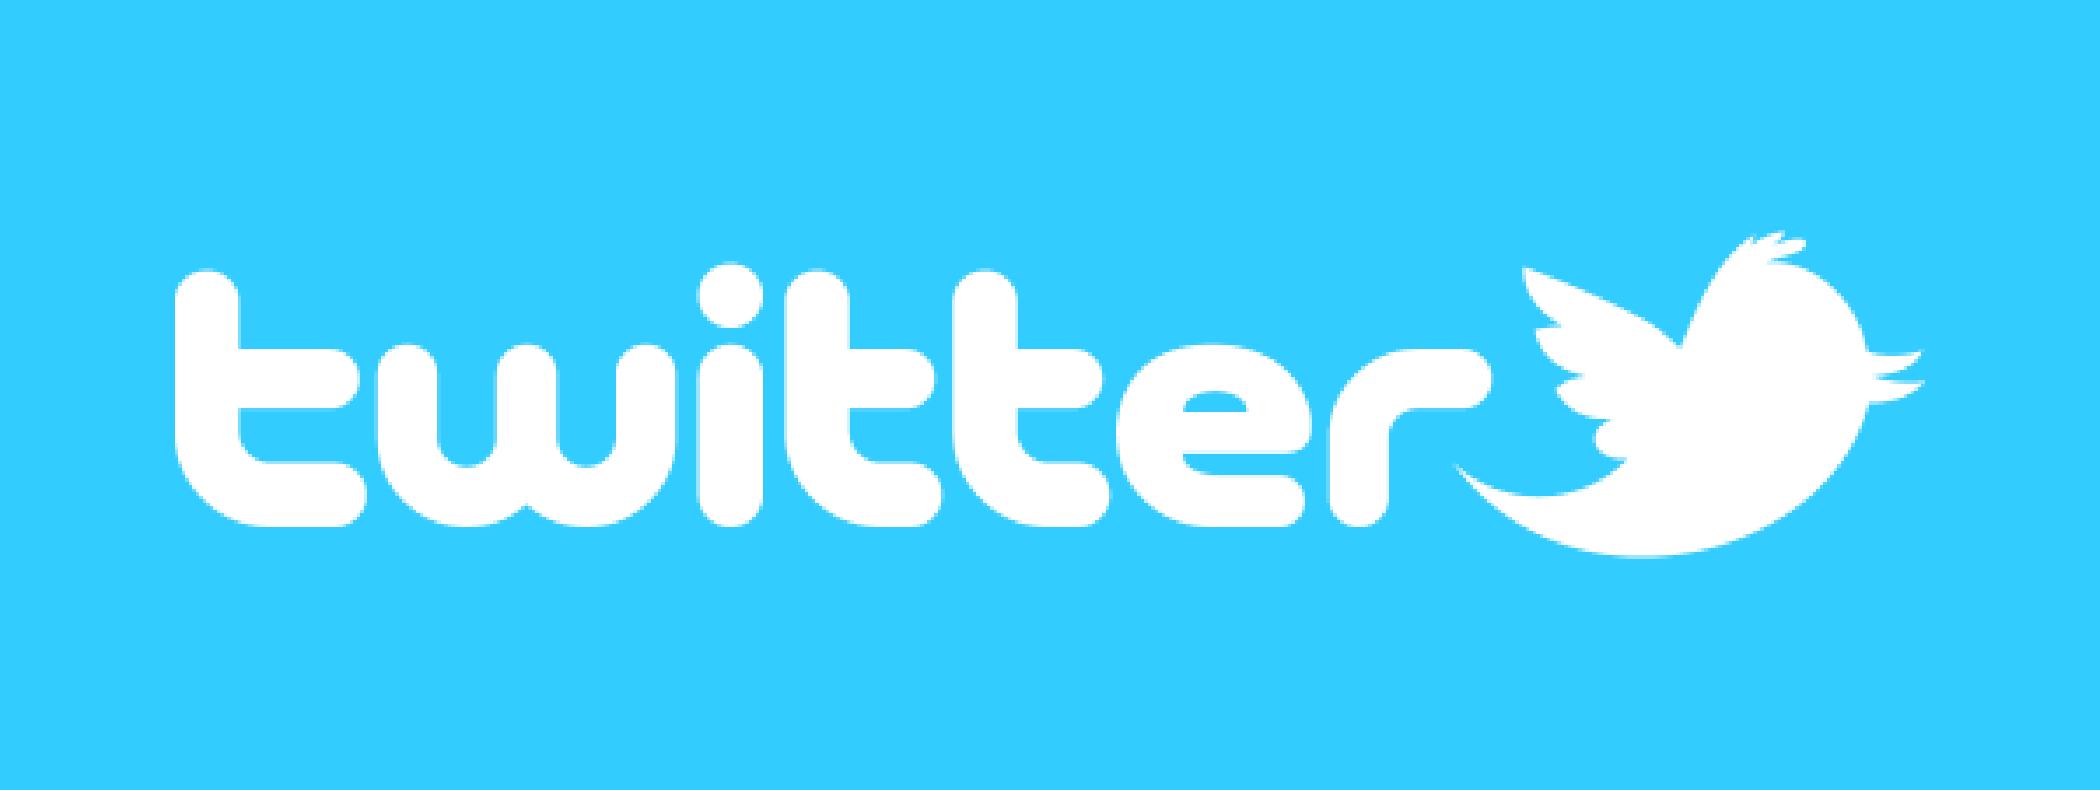 logo twitter.png